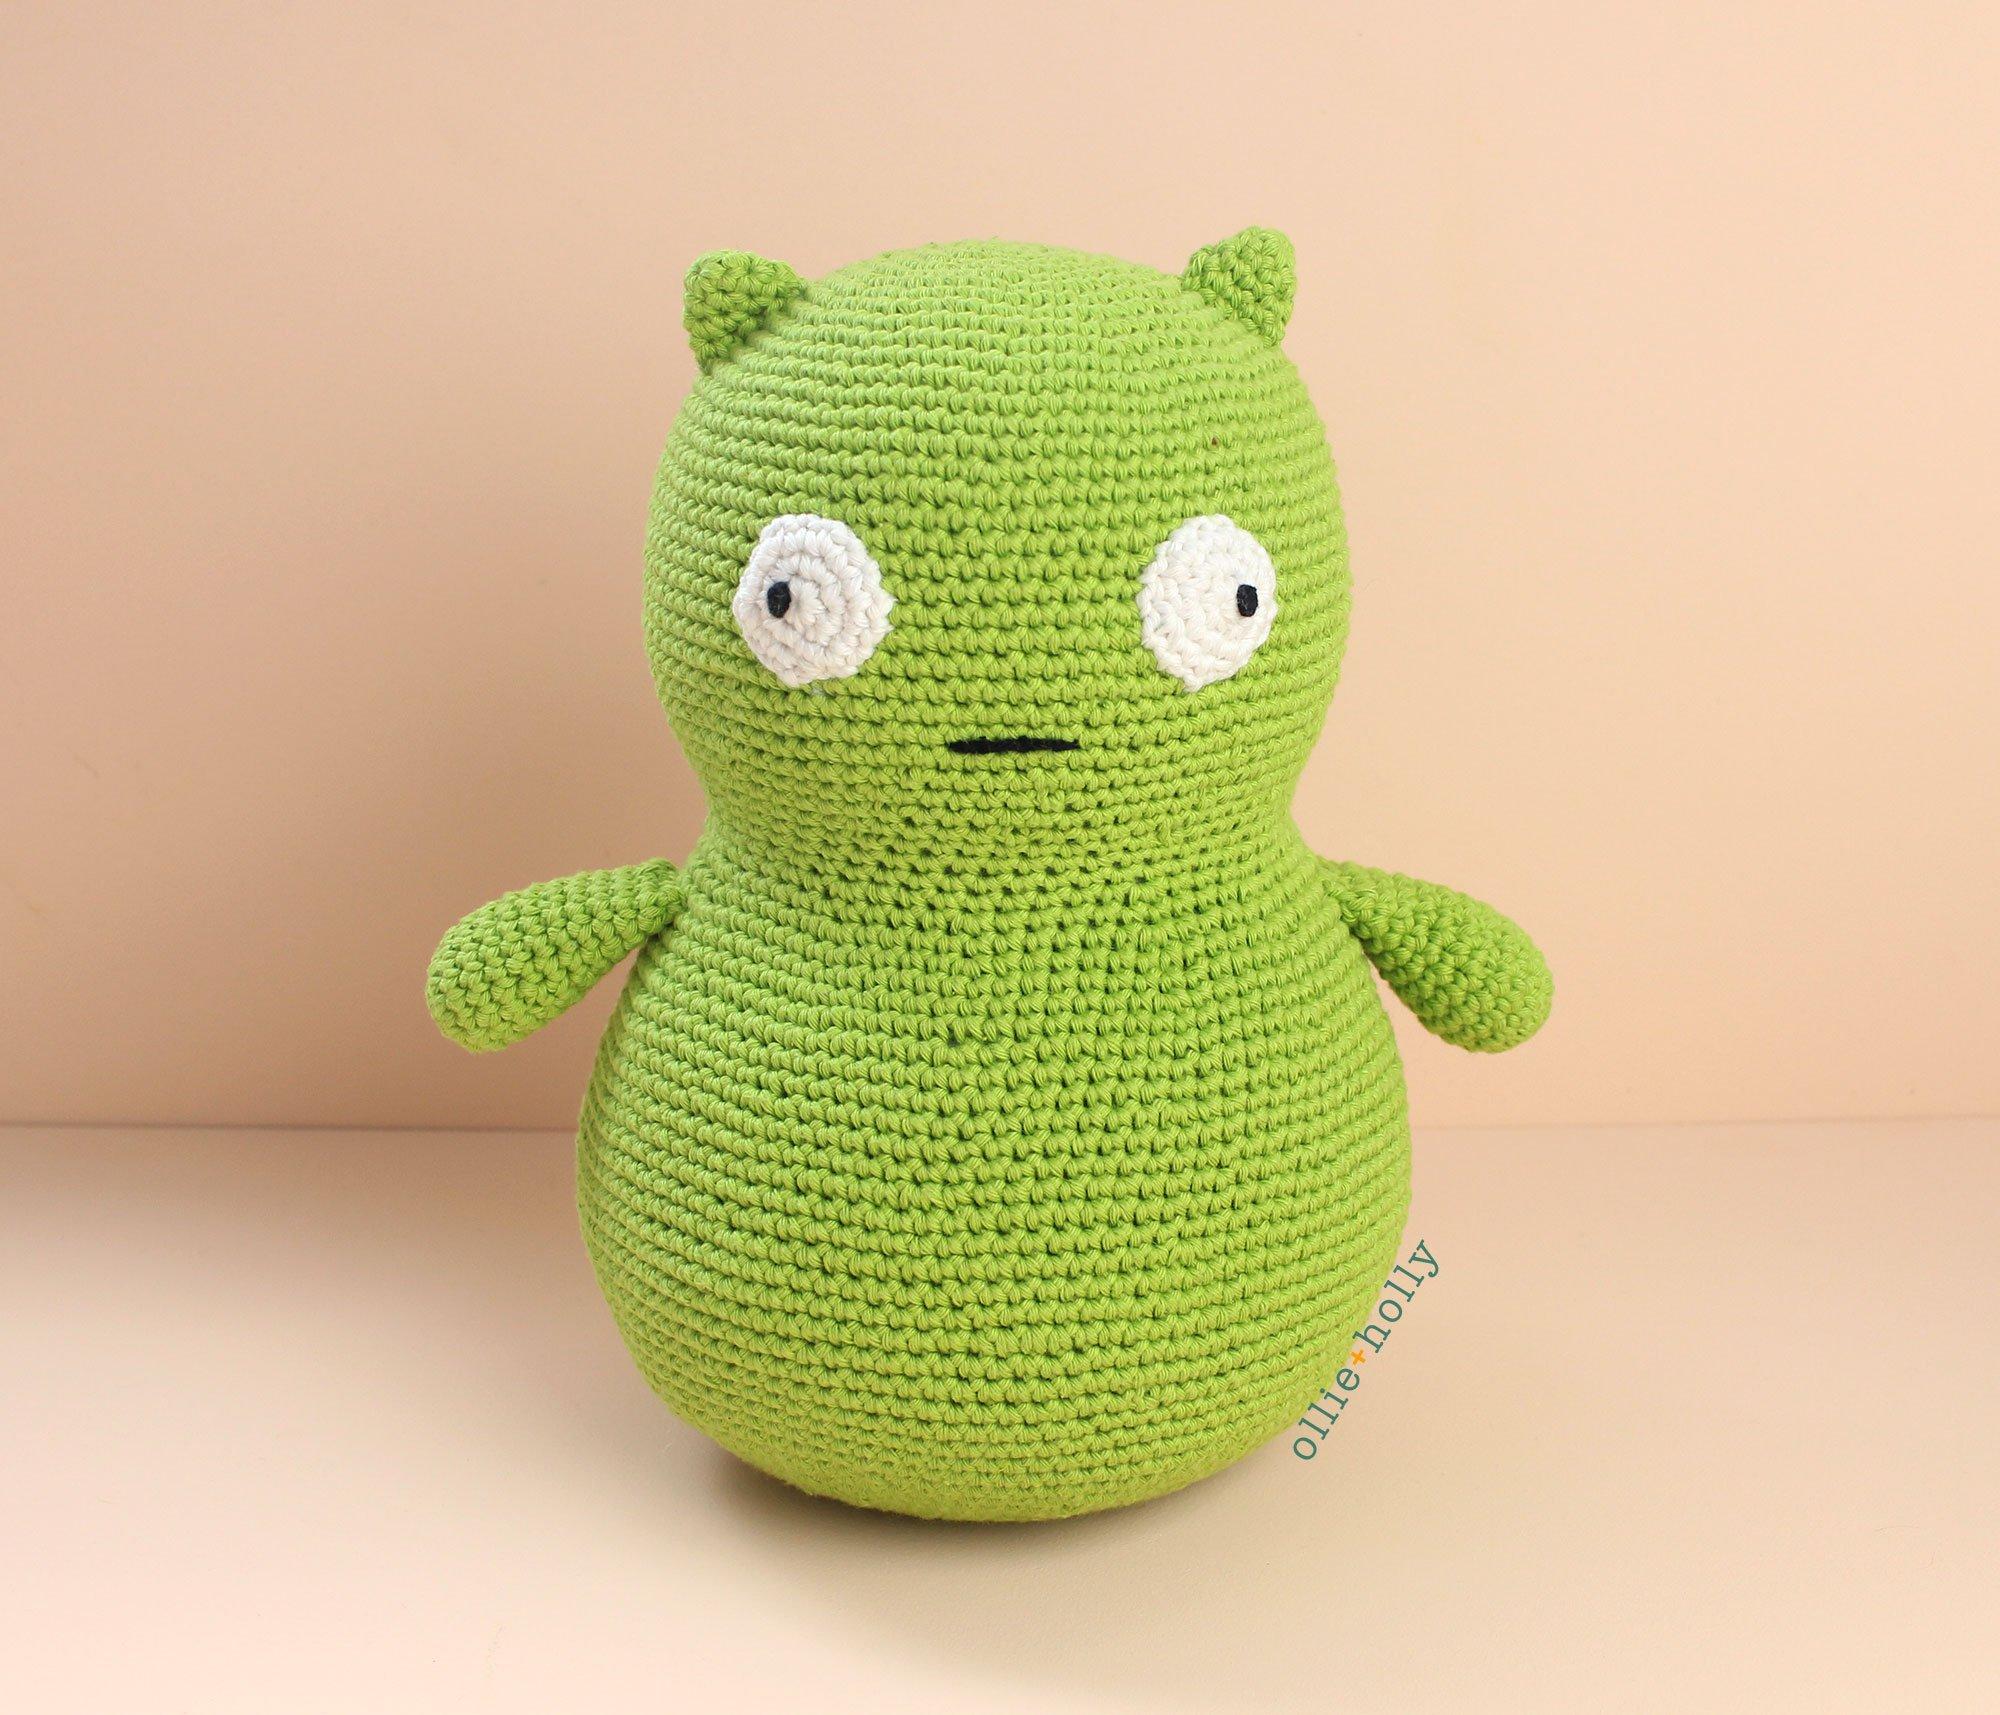 Crochet Amigurumi Garden Animal Toys Free Patterns | 1715x2000